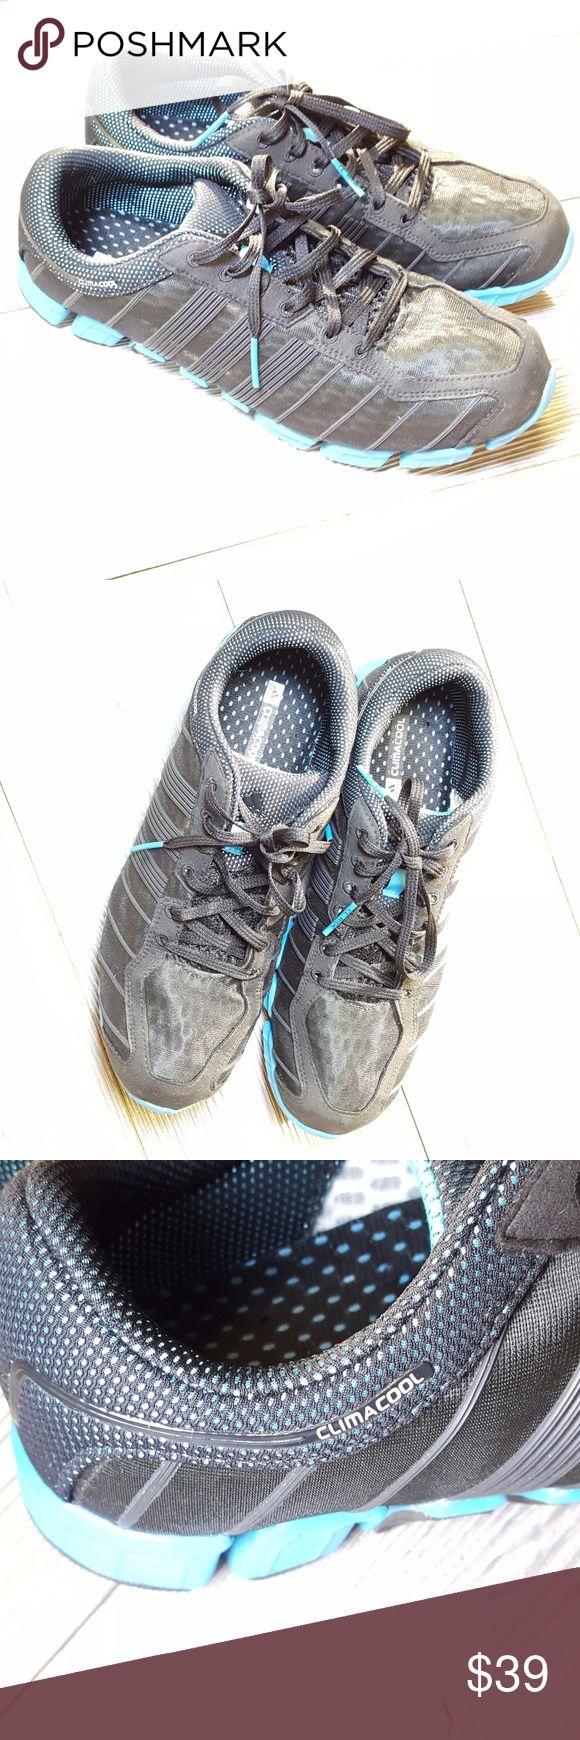 adidas climacool modulation black blue running 10 adidas climacool modulation black blue running shoes mesh cc ride us 10 g51911 cute black and blue m